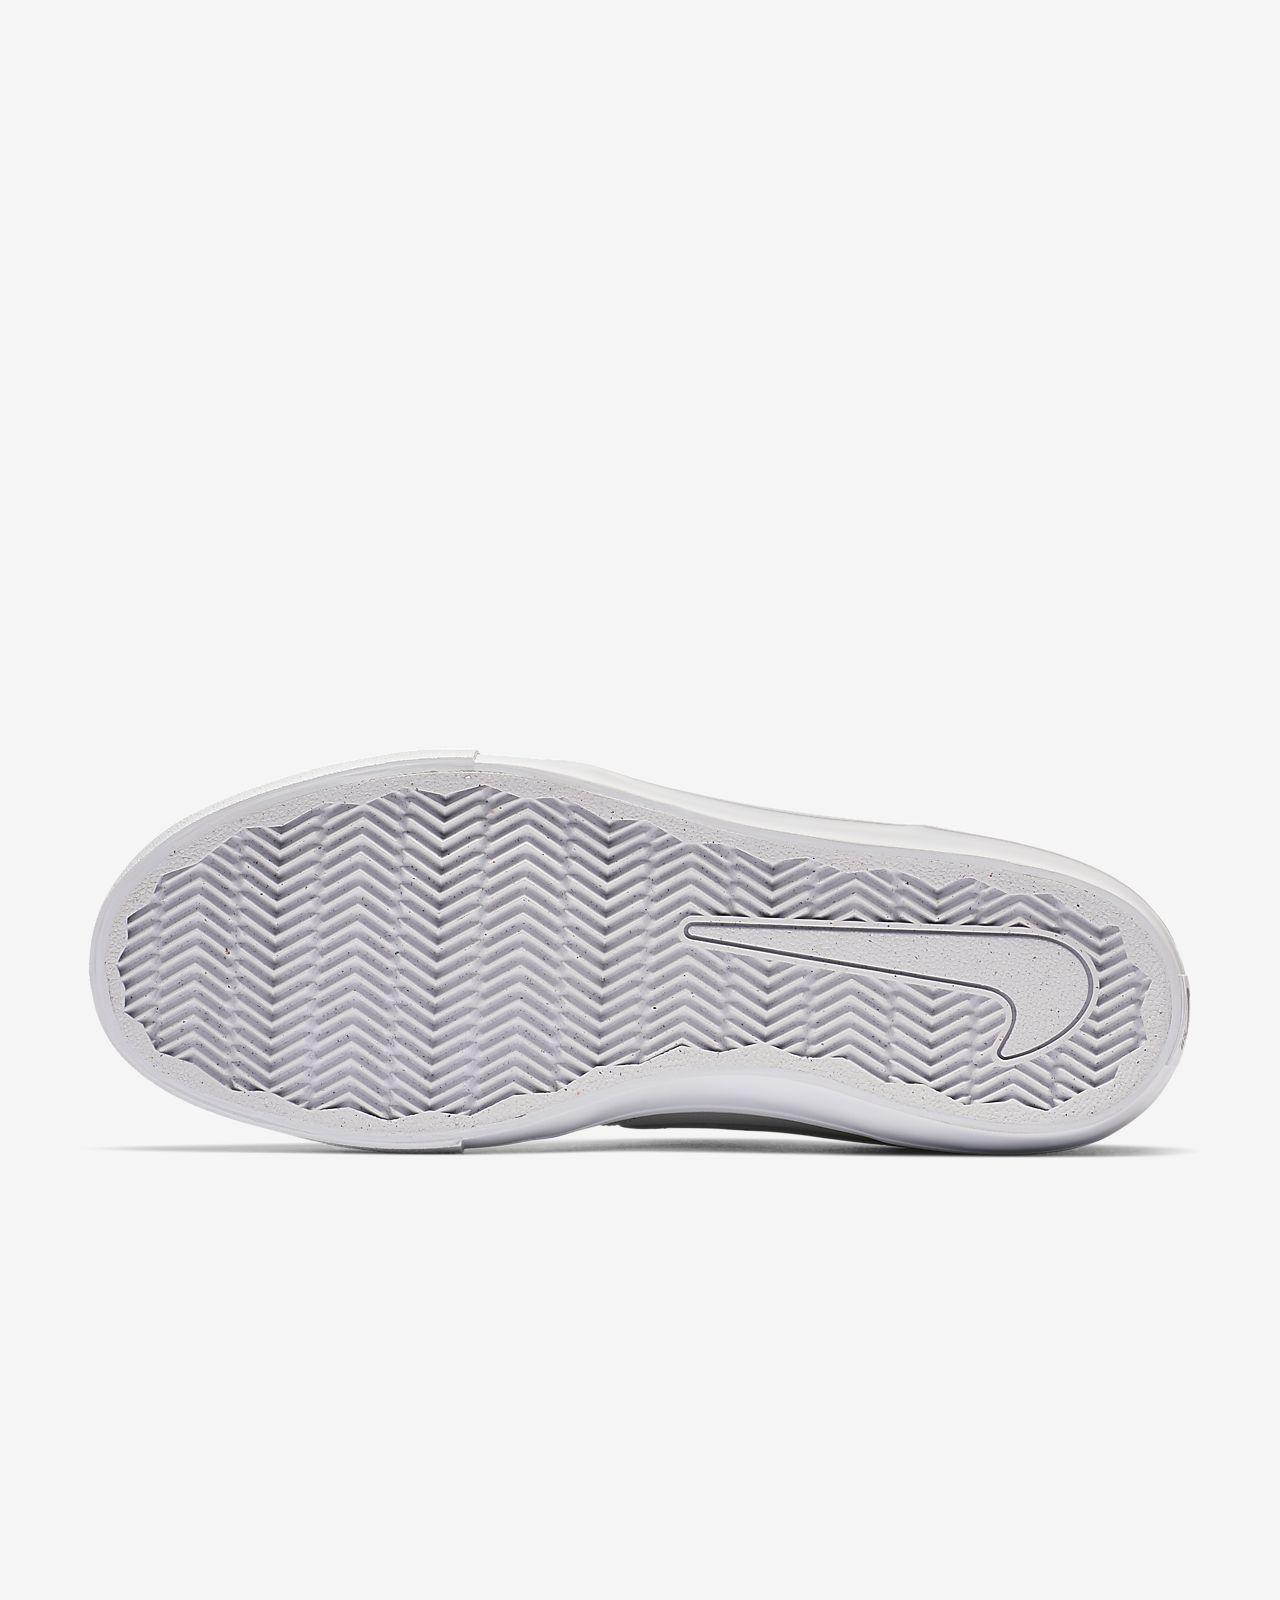 brand new 13344 470b8 ... Chaussure de skateboard Nike SB Solarsoft Portmore II pour Homme